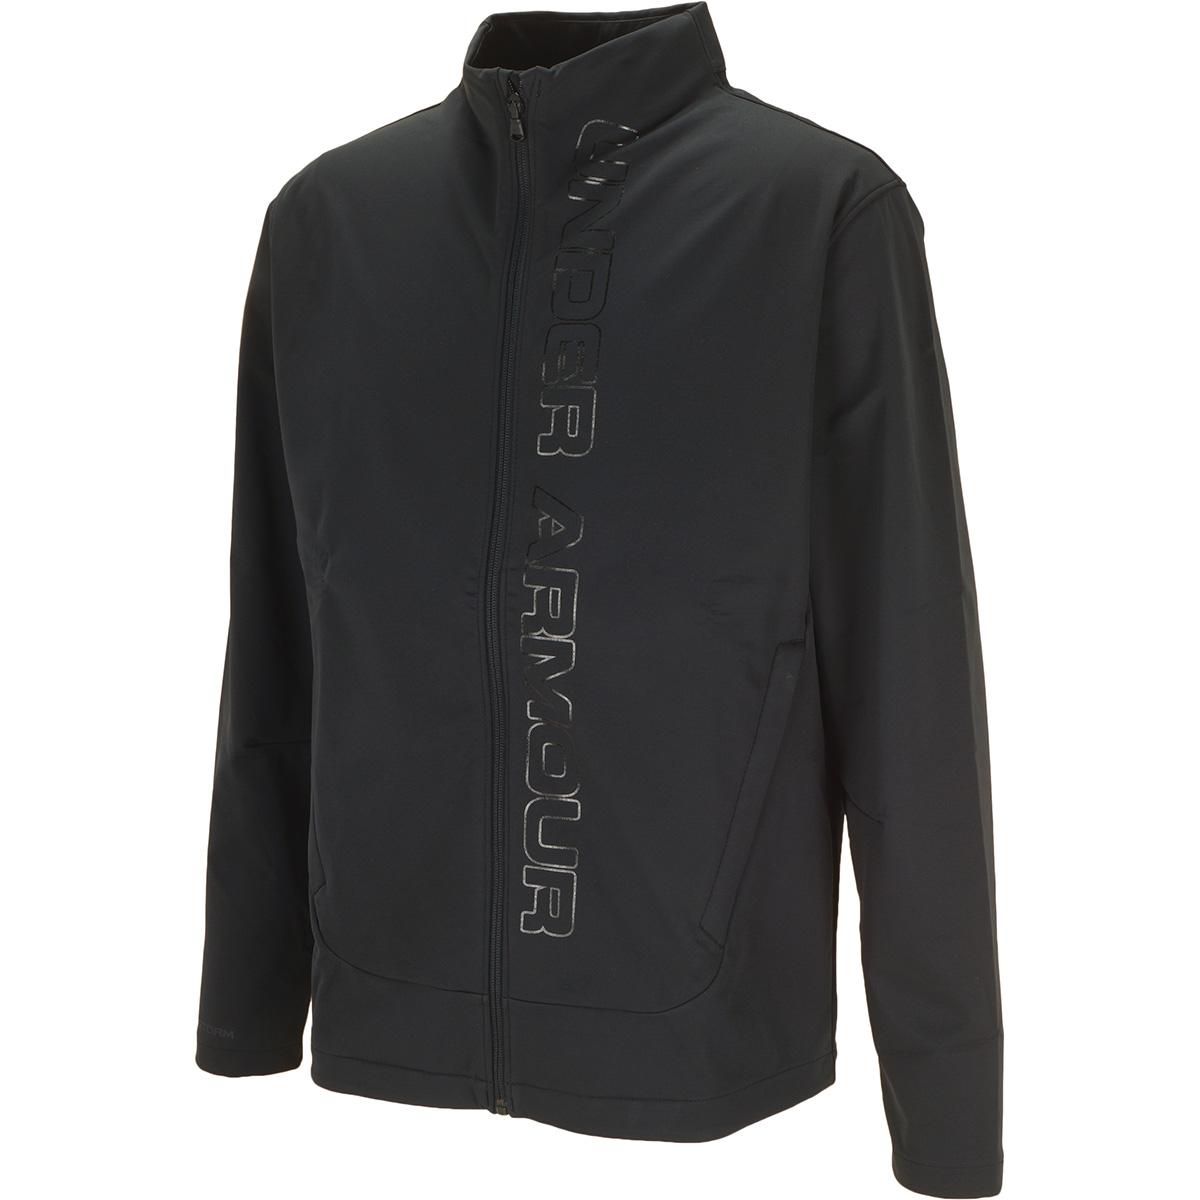 UA Storm フルジップジャケット